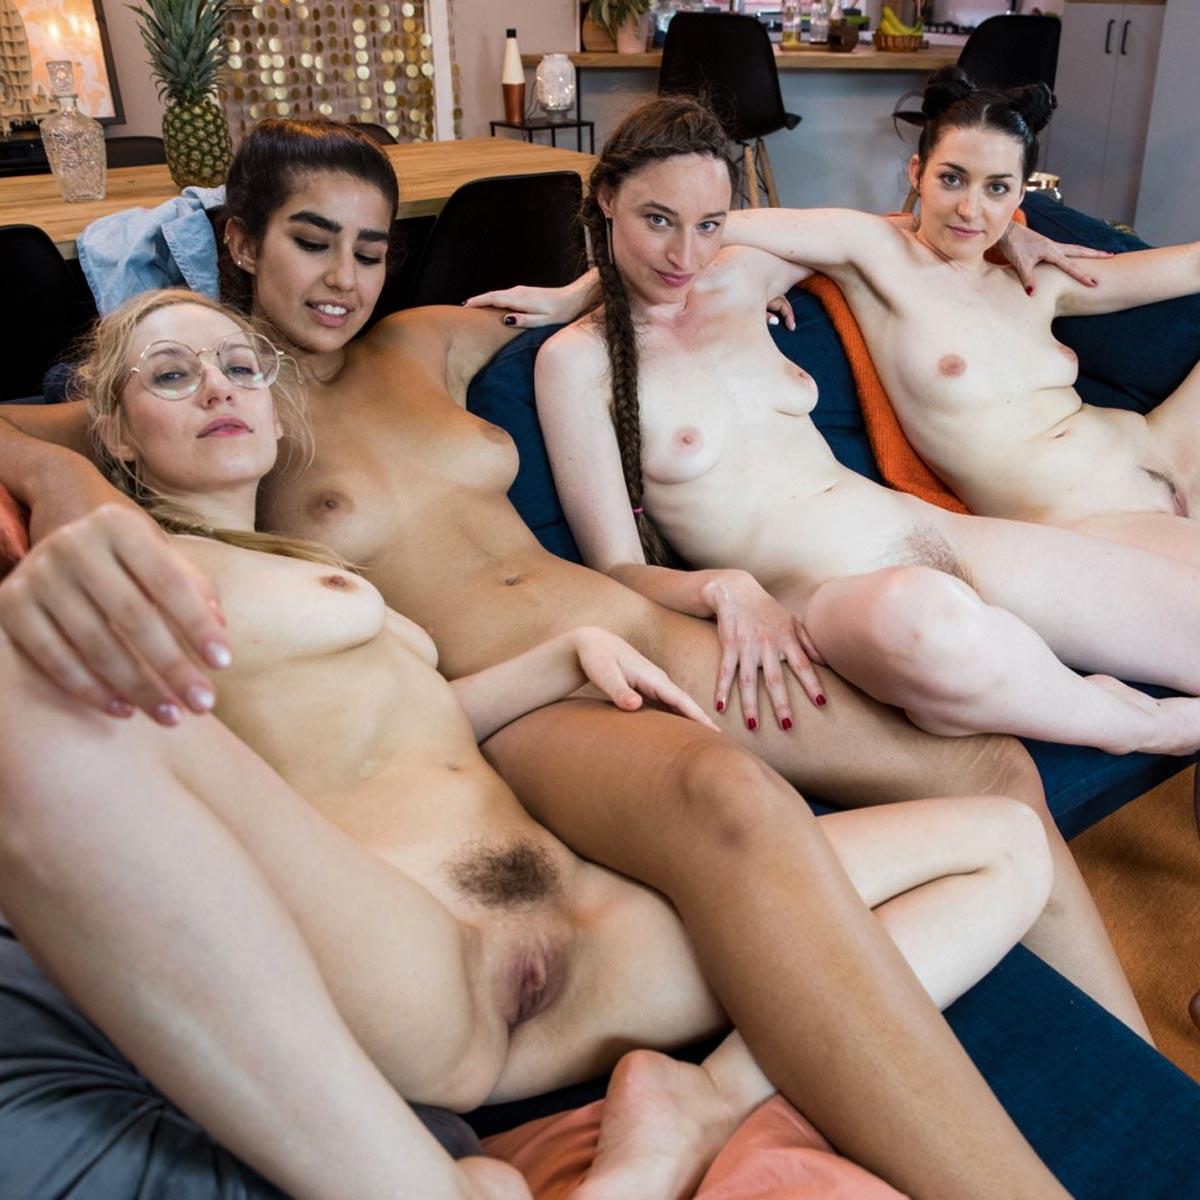 Ersties, Female Porn made by girls. Lesbian sex,  nude masturbating women in genuine videos. Delicious Amateur sex.